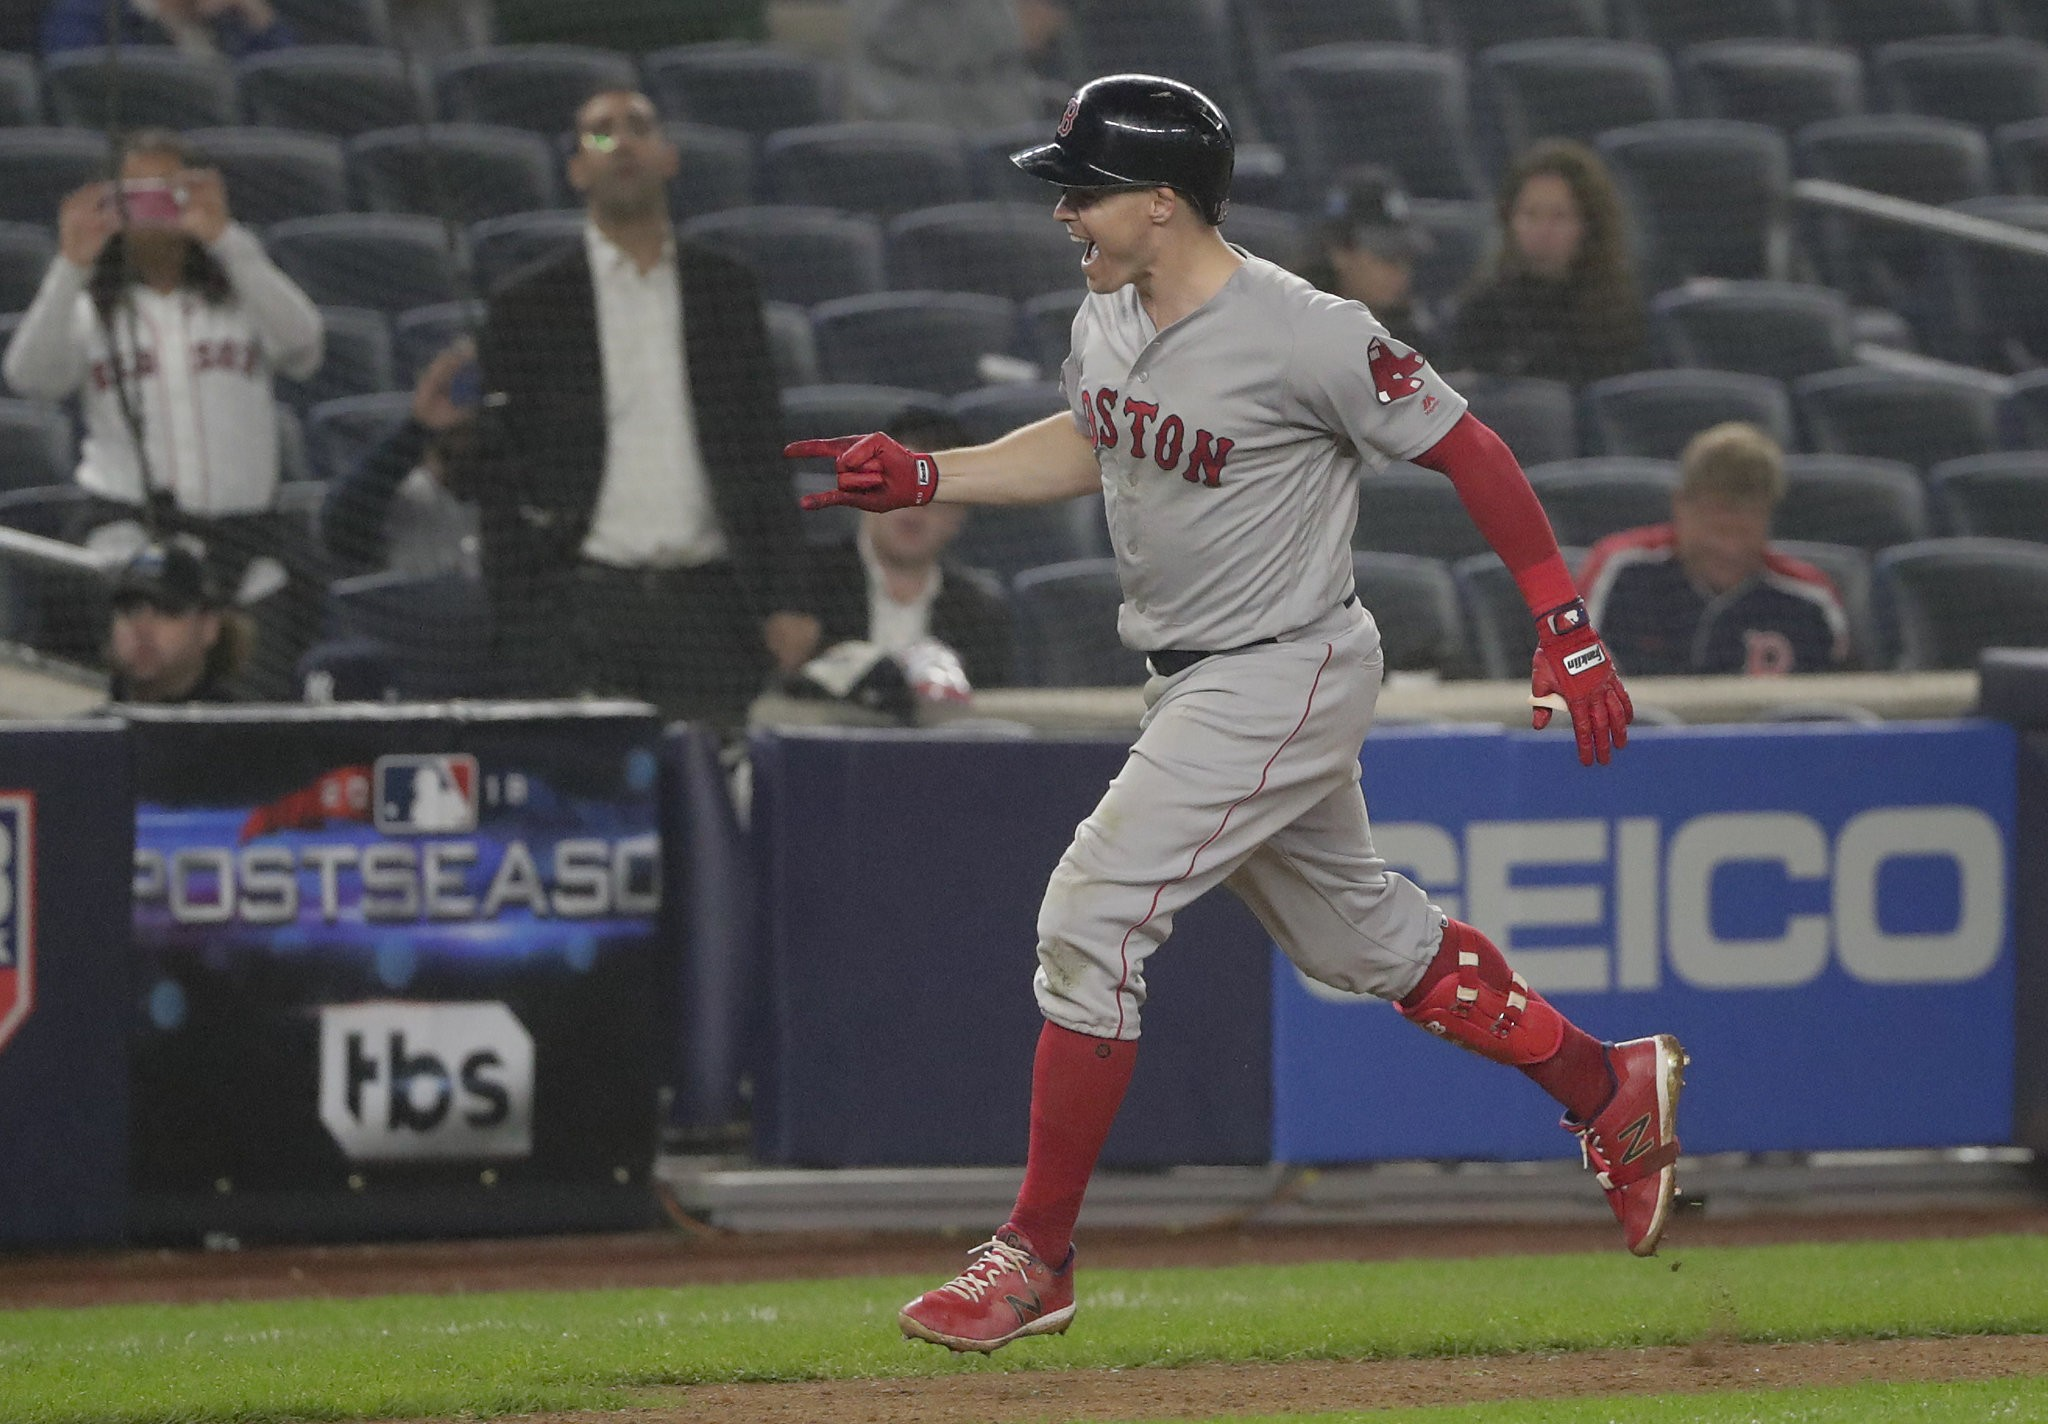 Brock Holt Boston Red Sox Baseball Player Jersey